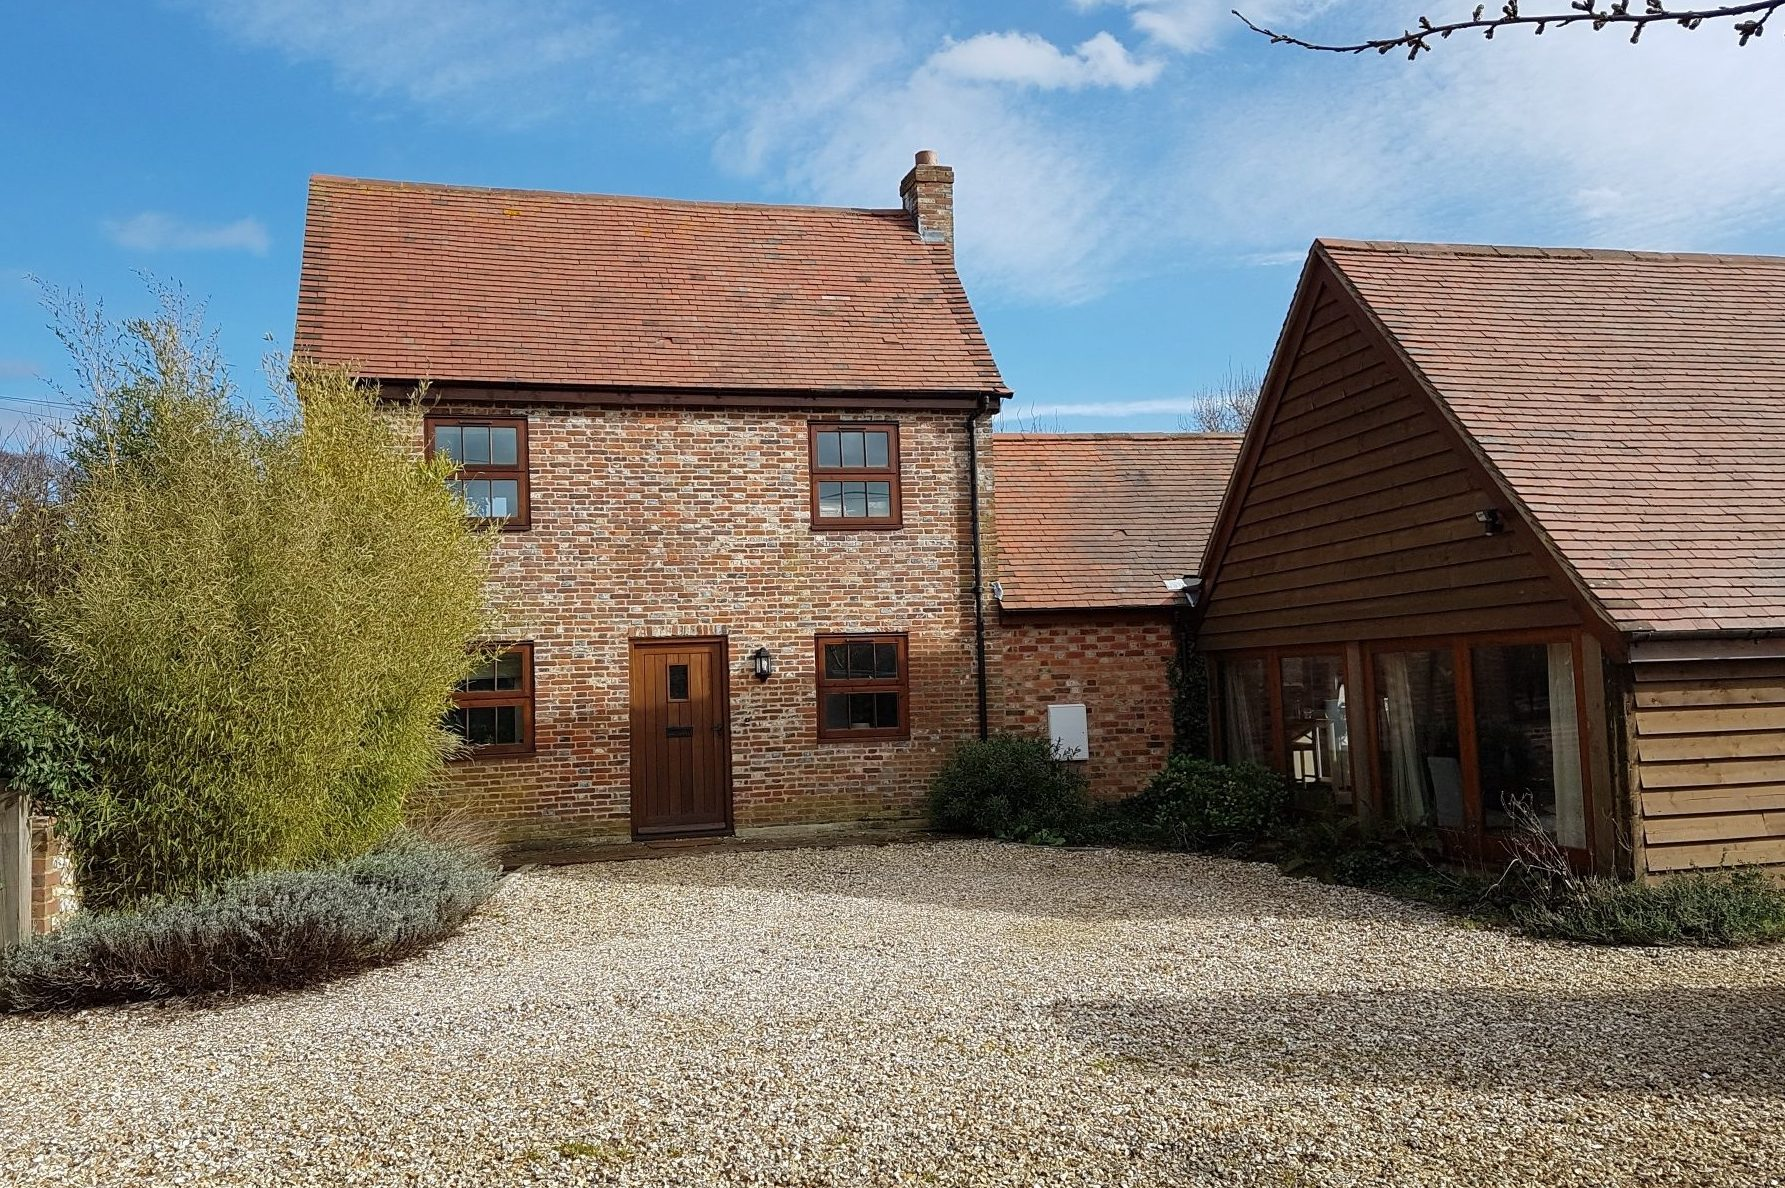 West Hoe Cottage